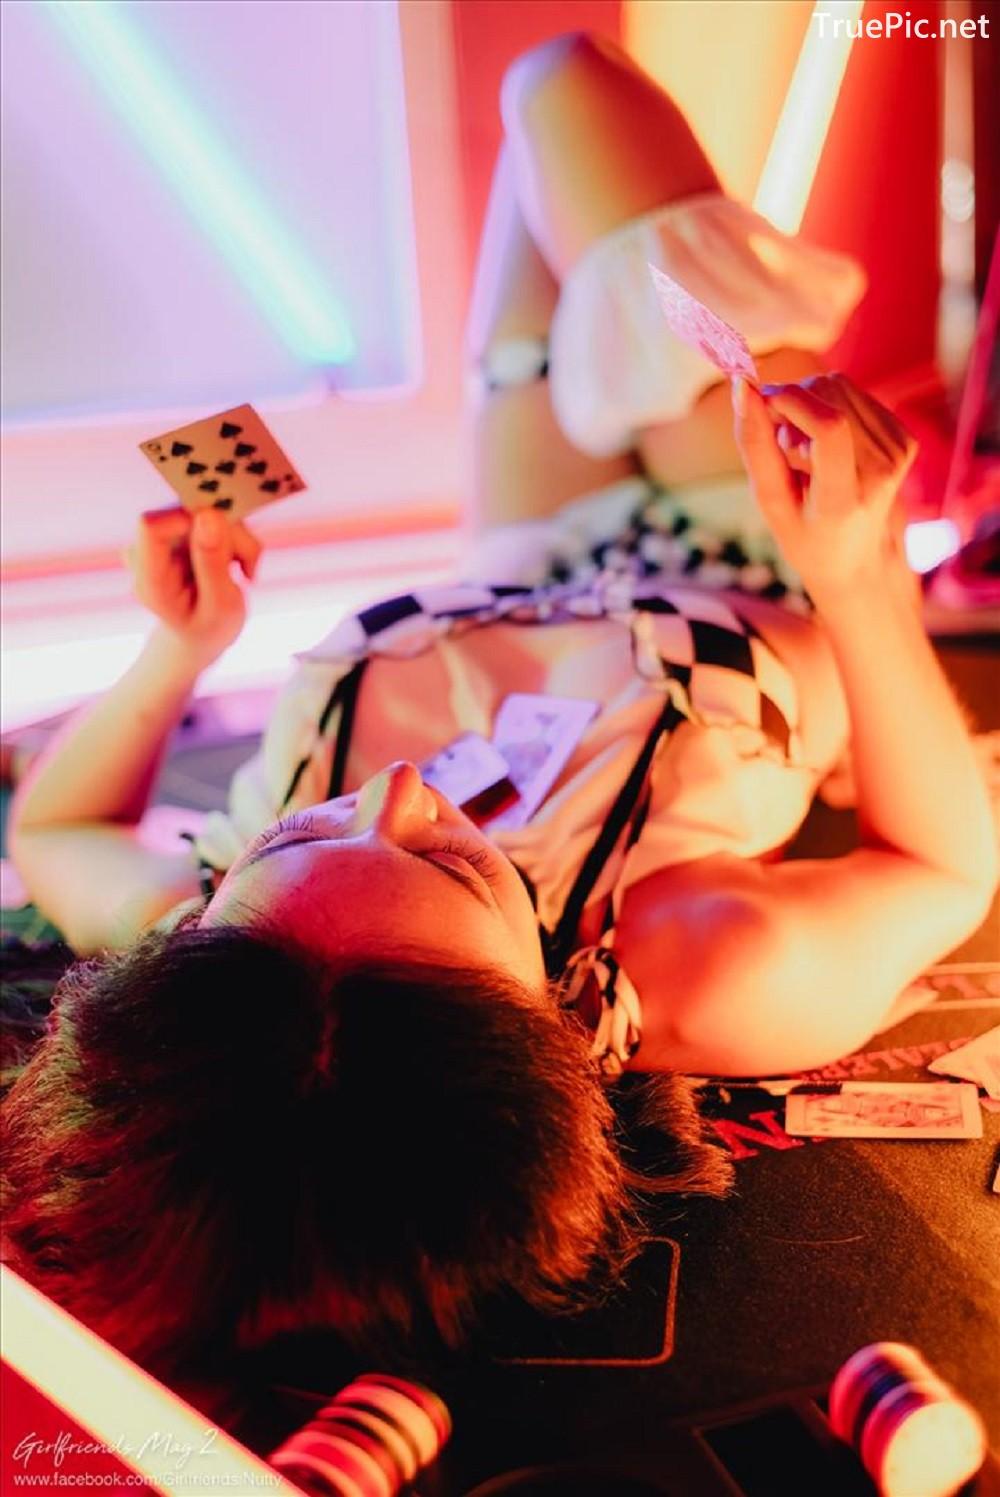 Image-Thailand-Beautiful-Model-Piyatida-Rotjutharak-Sexy-Gambling-Girl-TruePic.net- Picture-7